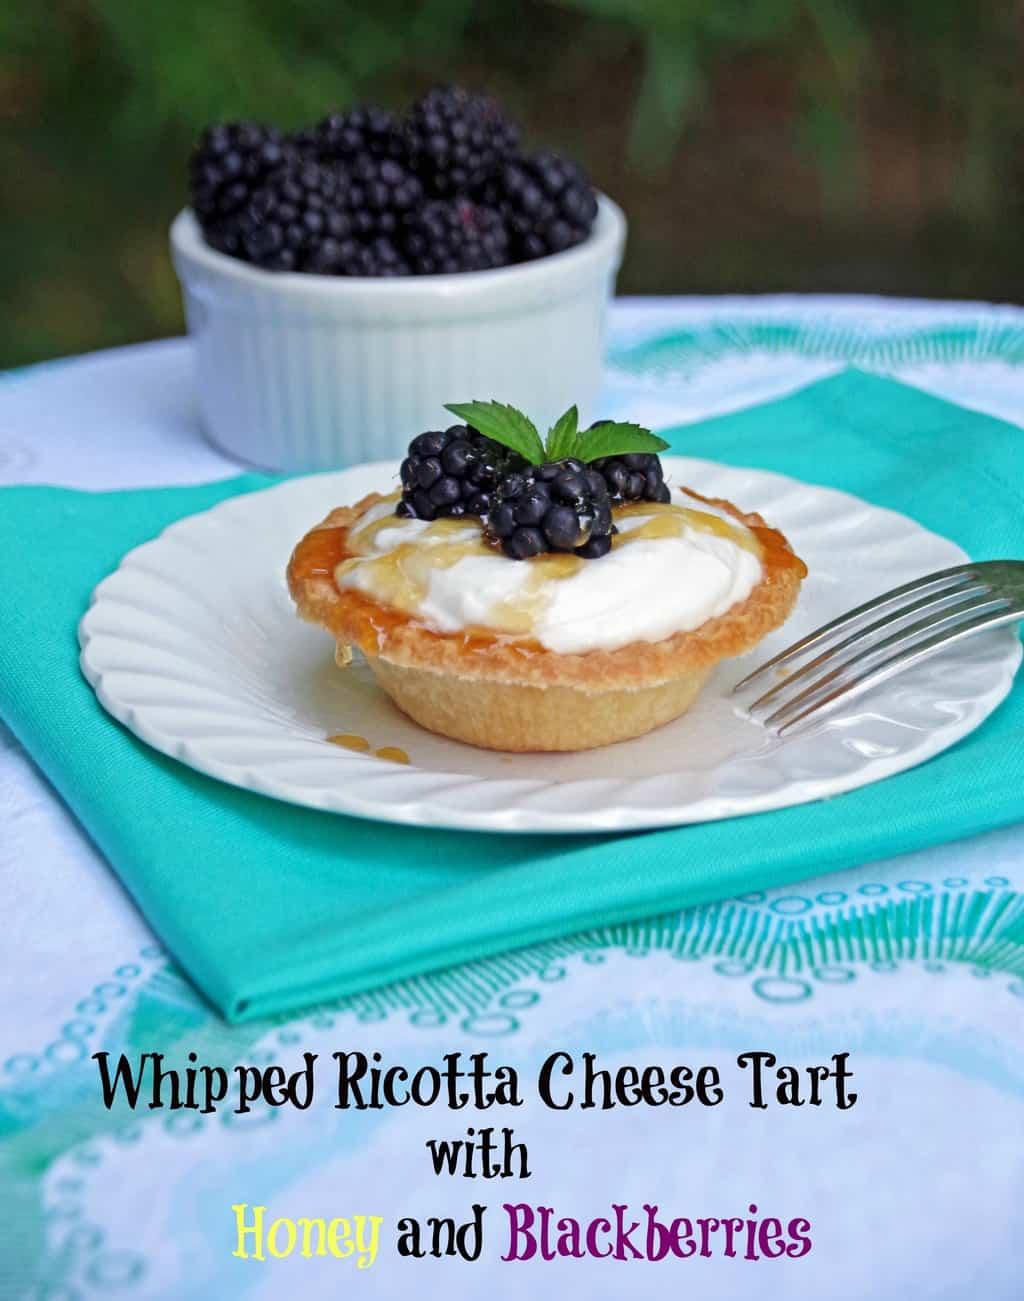 Whipped Ricotta Cheese Tart with Honey and Fresh Blackberries2